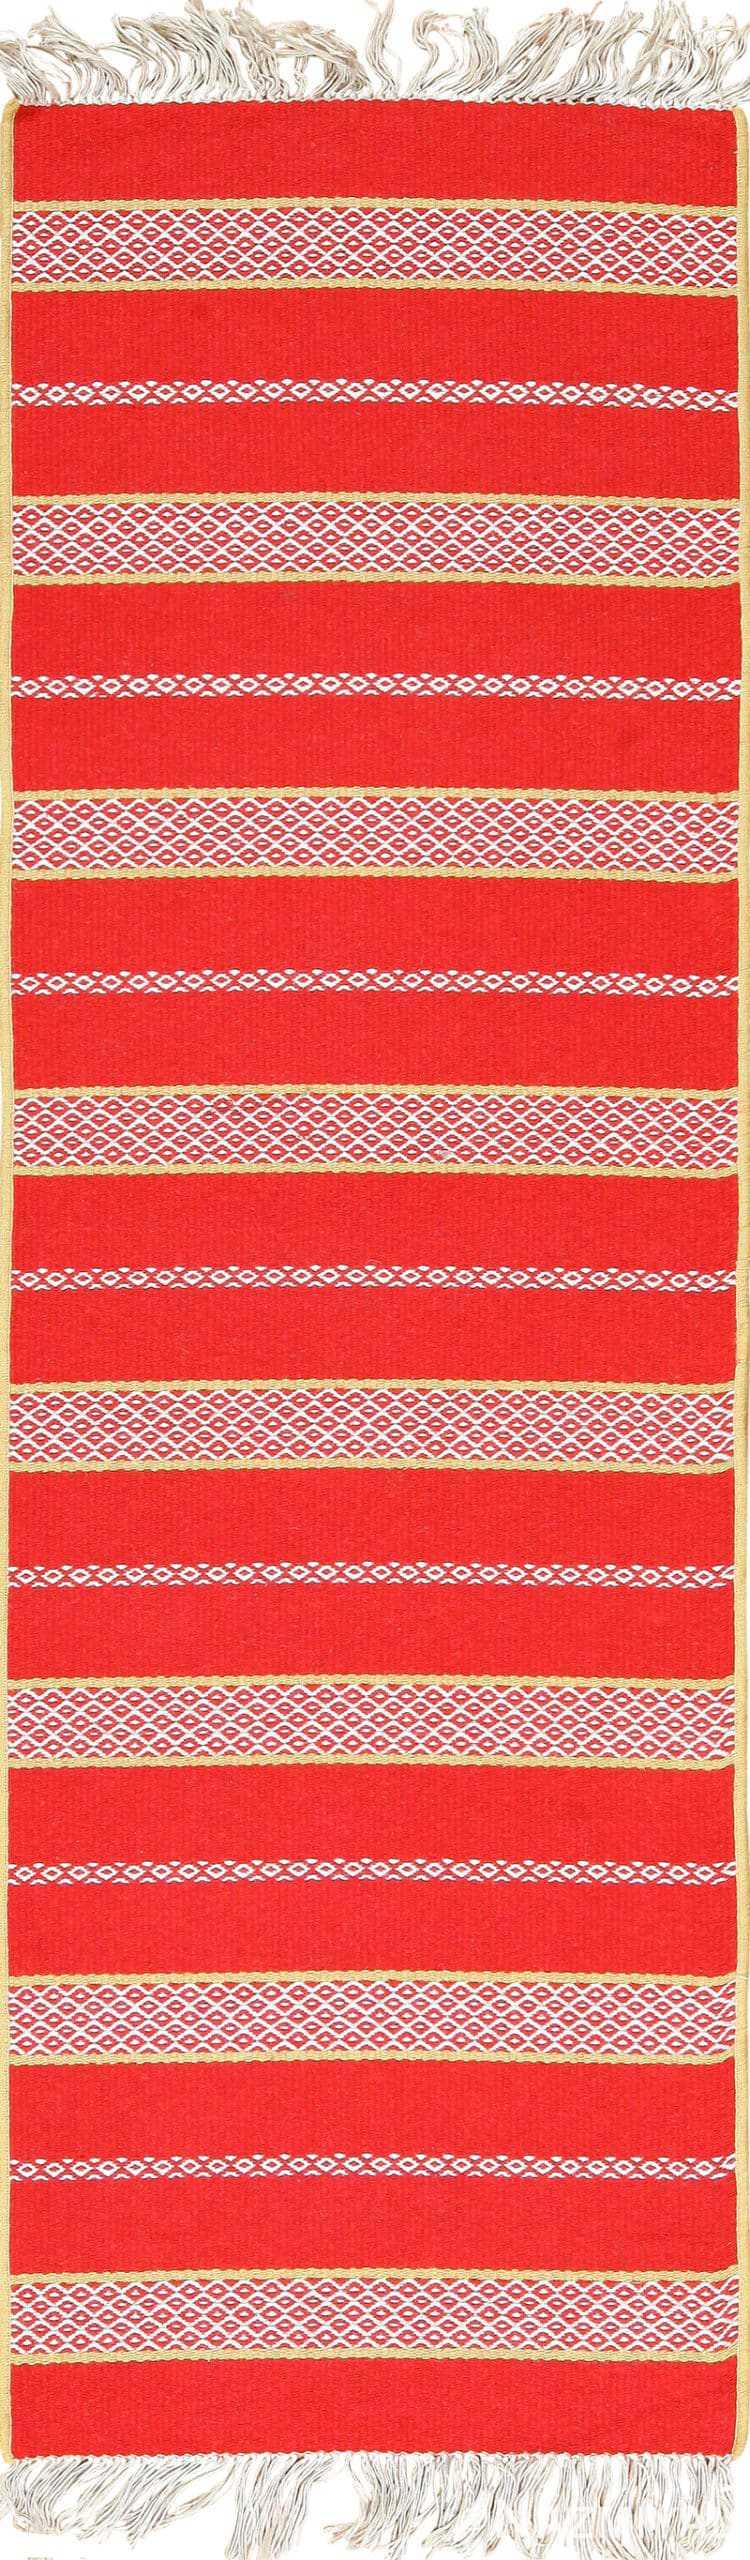 Red Colored Vintage Swedish Scandinavian Runner Rug 49561 by Nazmiyal